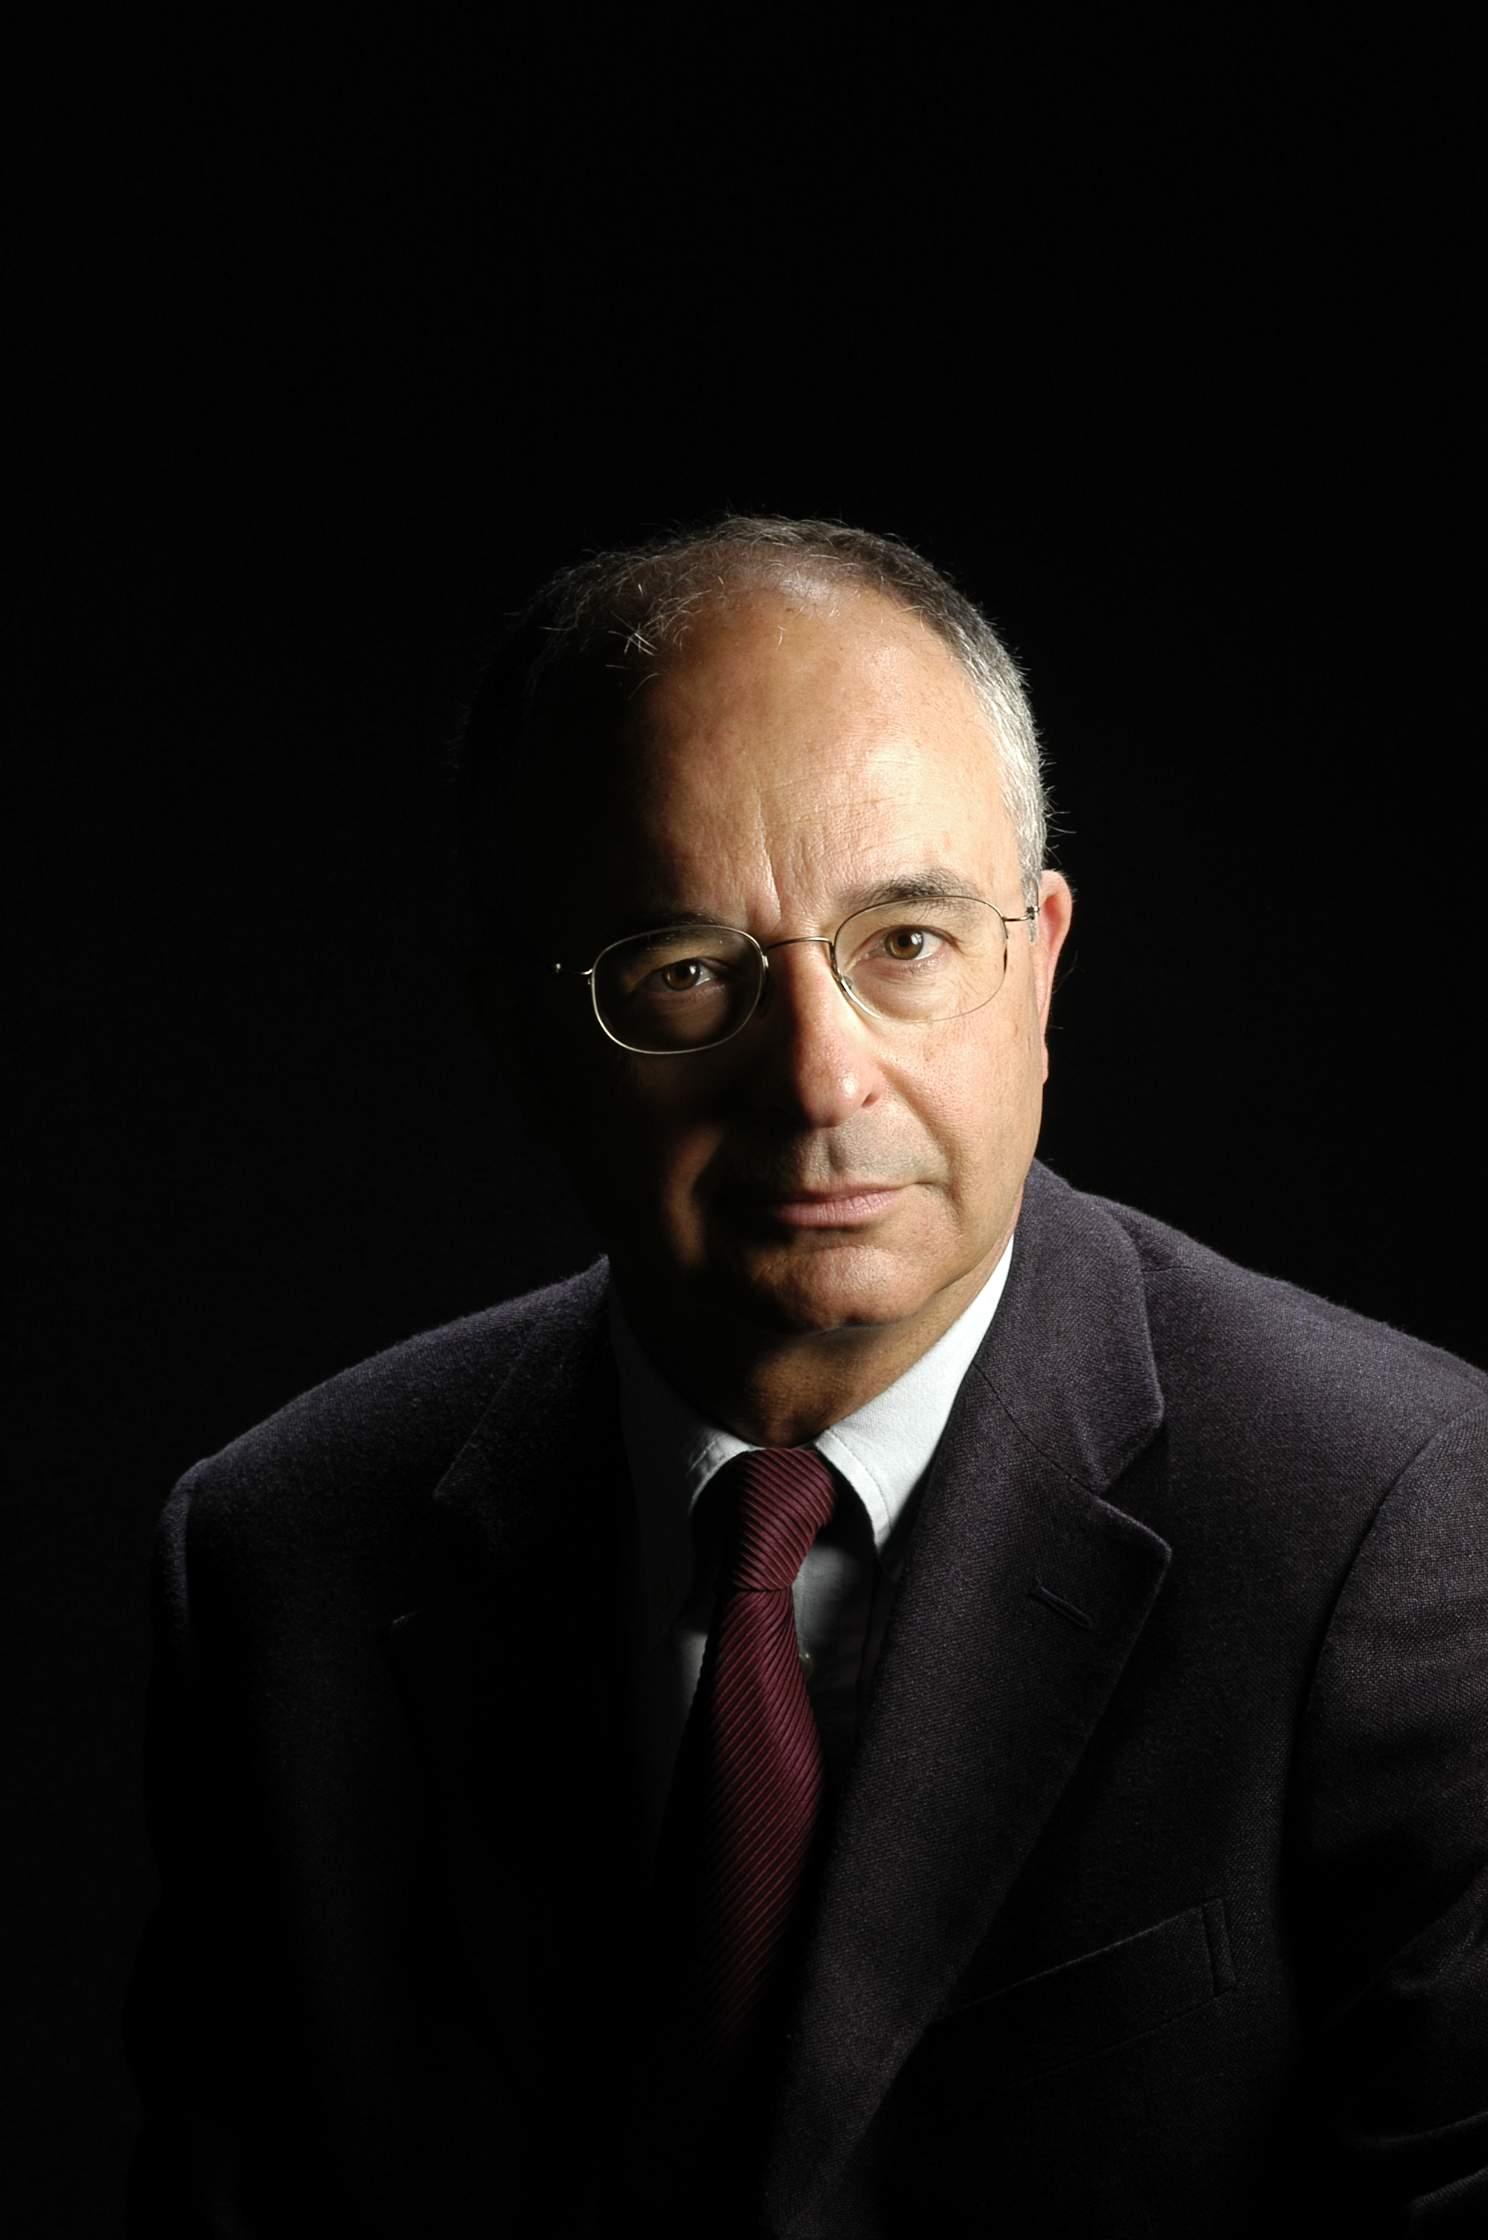 Sr. Miquel Solá Martin